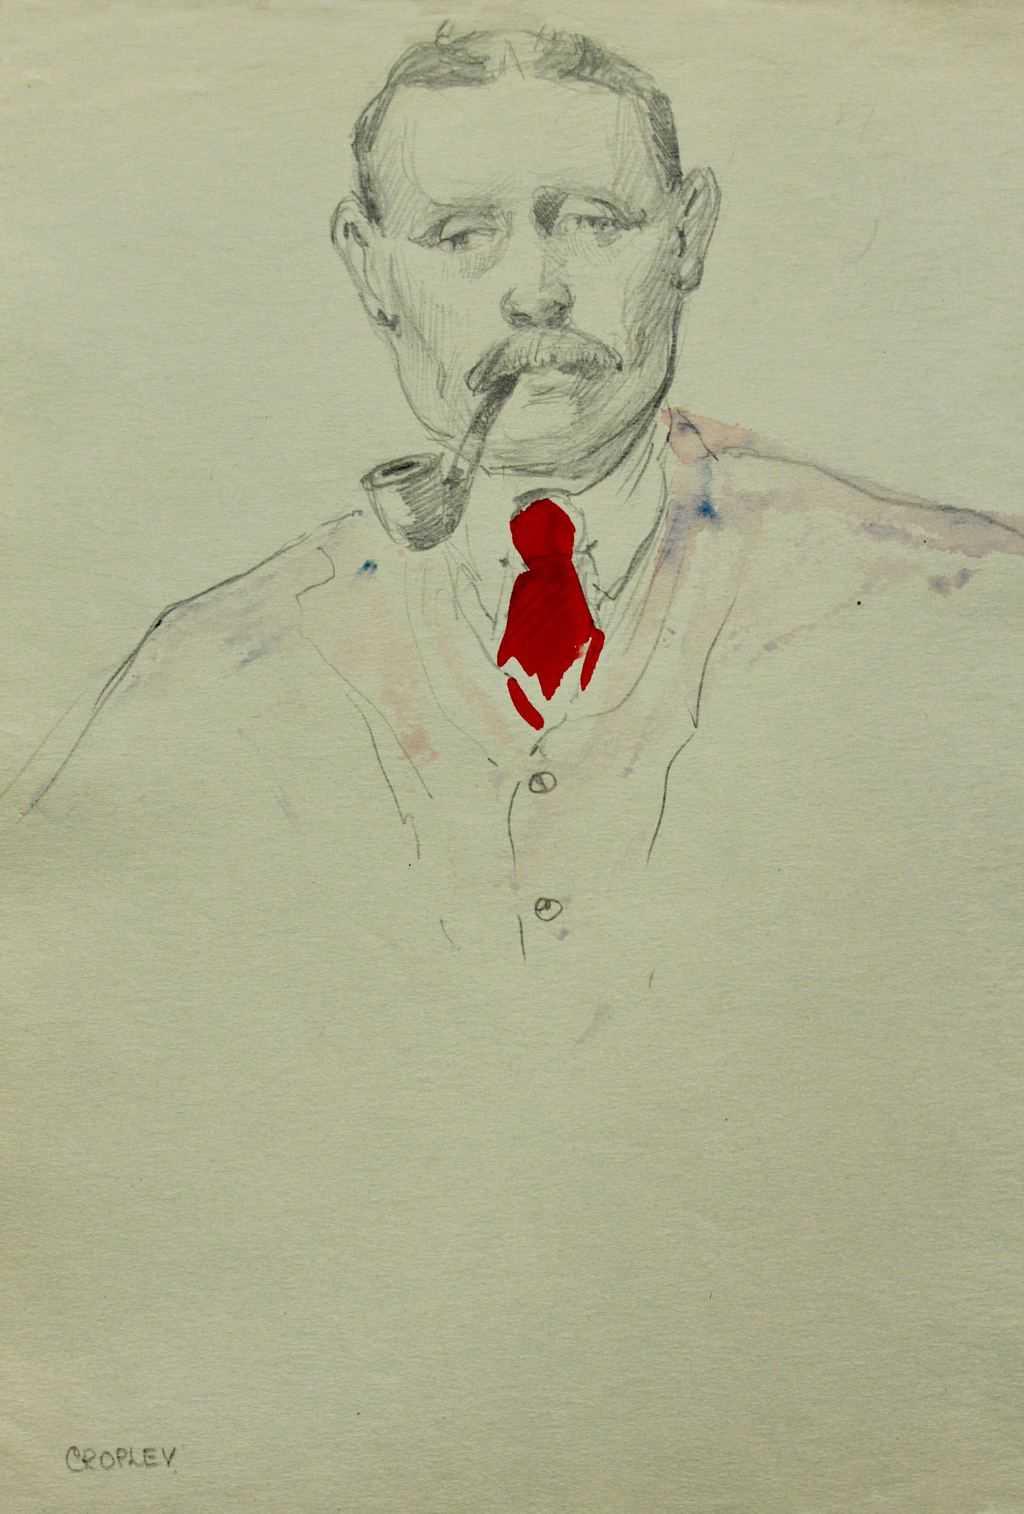 Sketch of CROPLEY